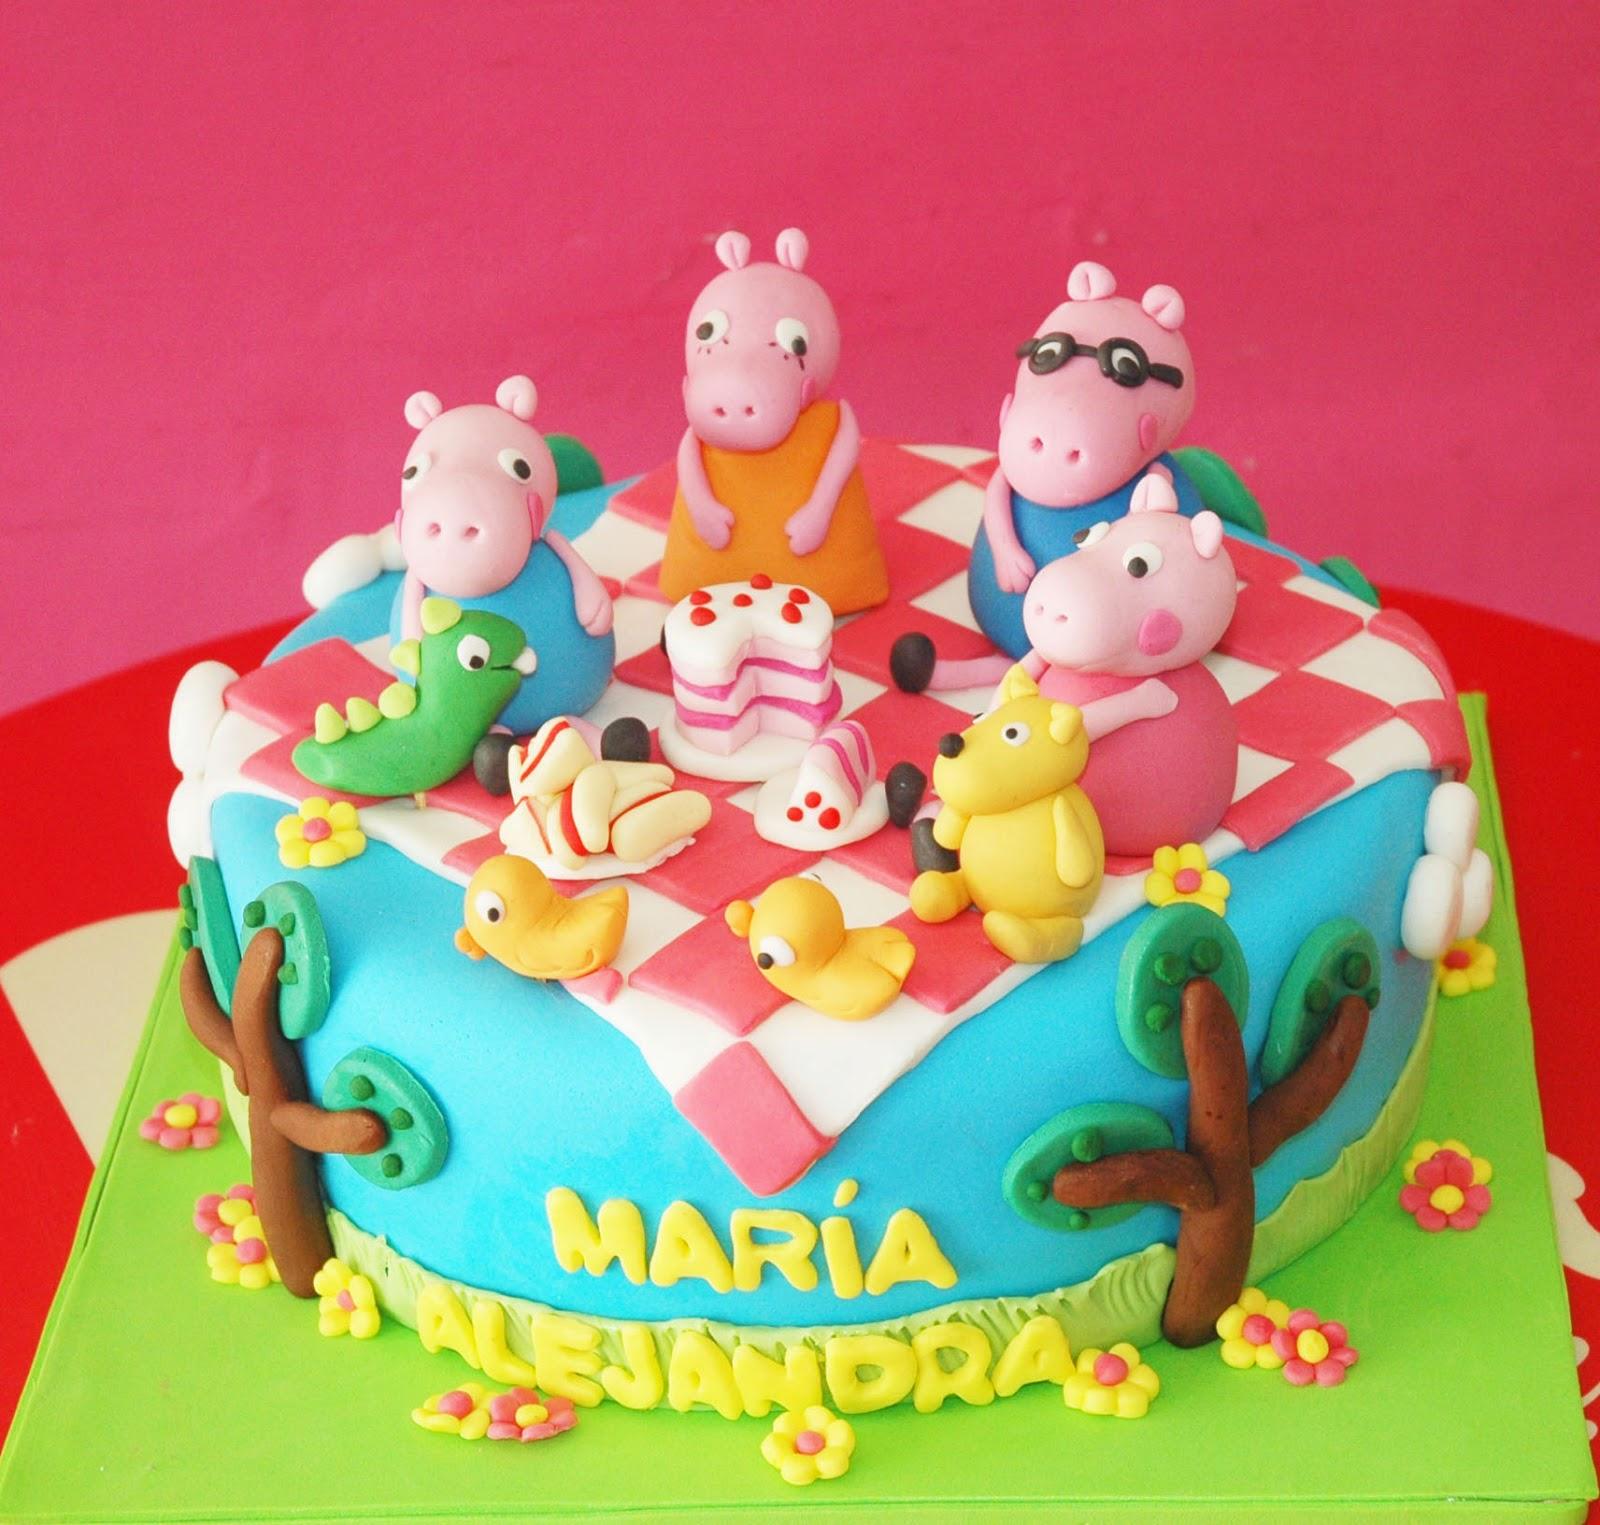 beula cakes: diciembre 2014